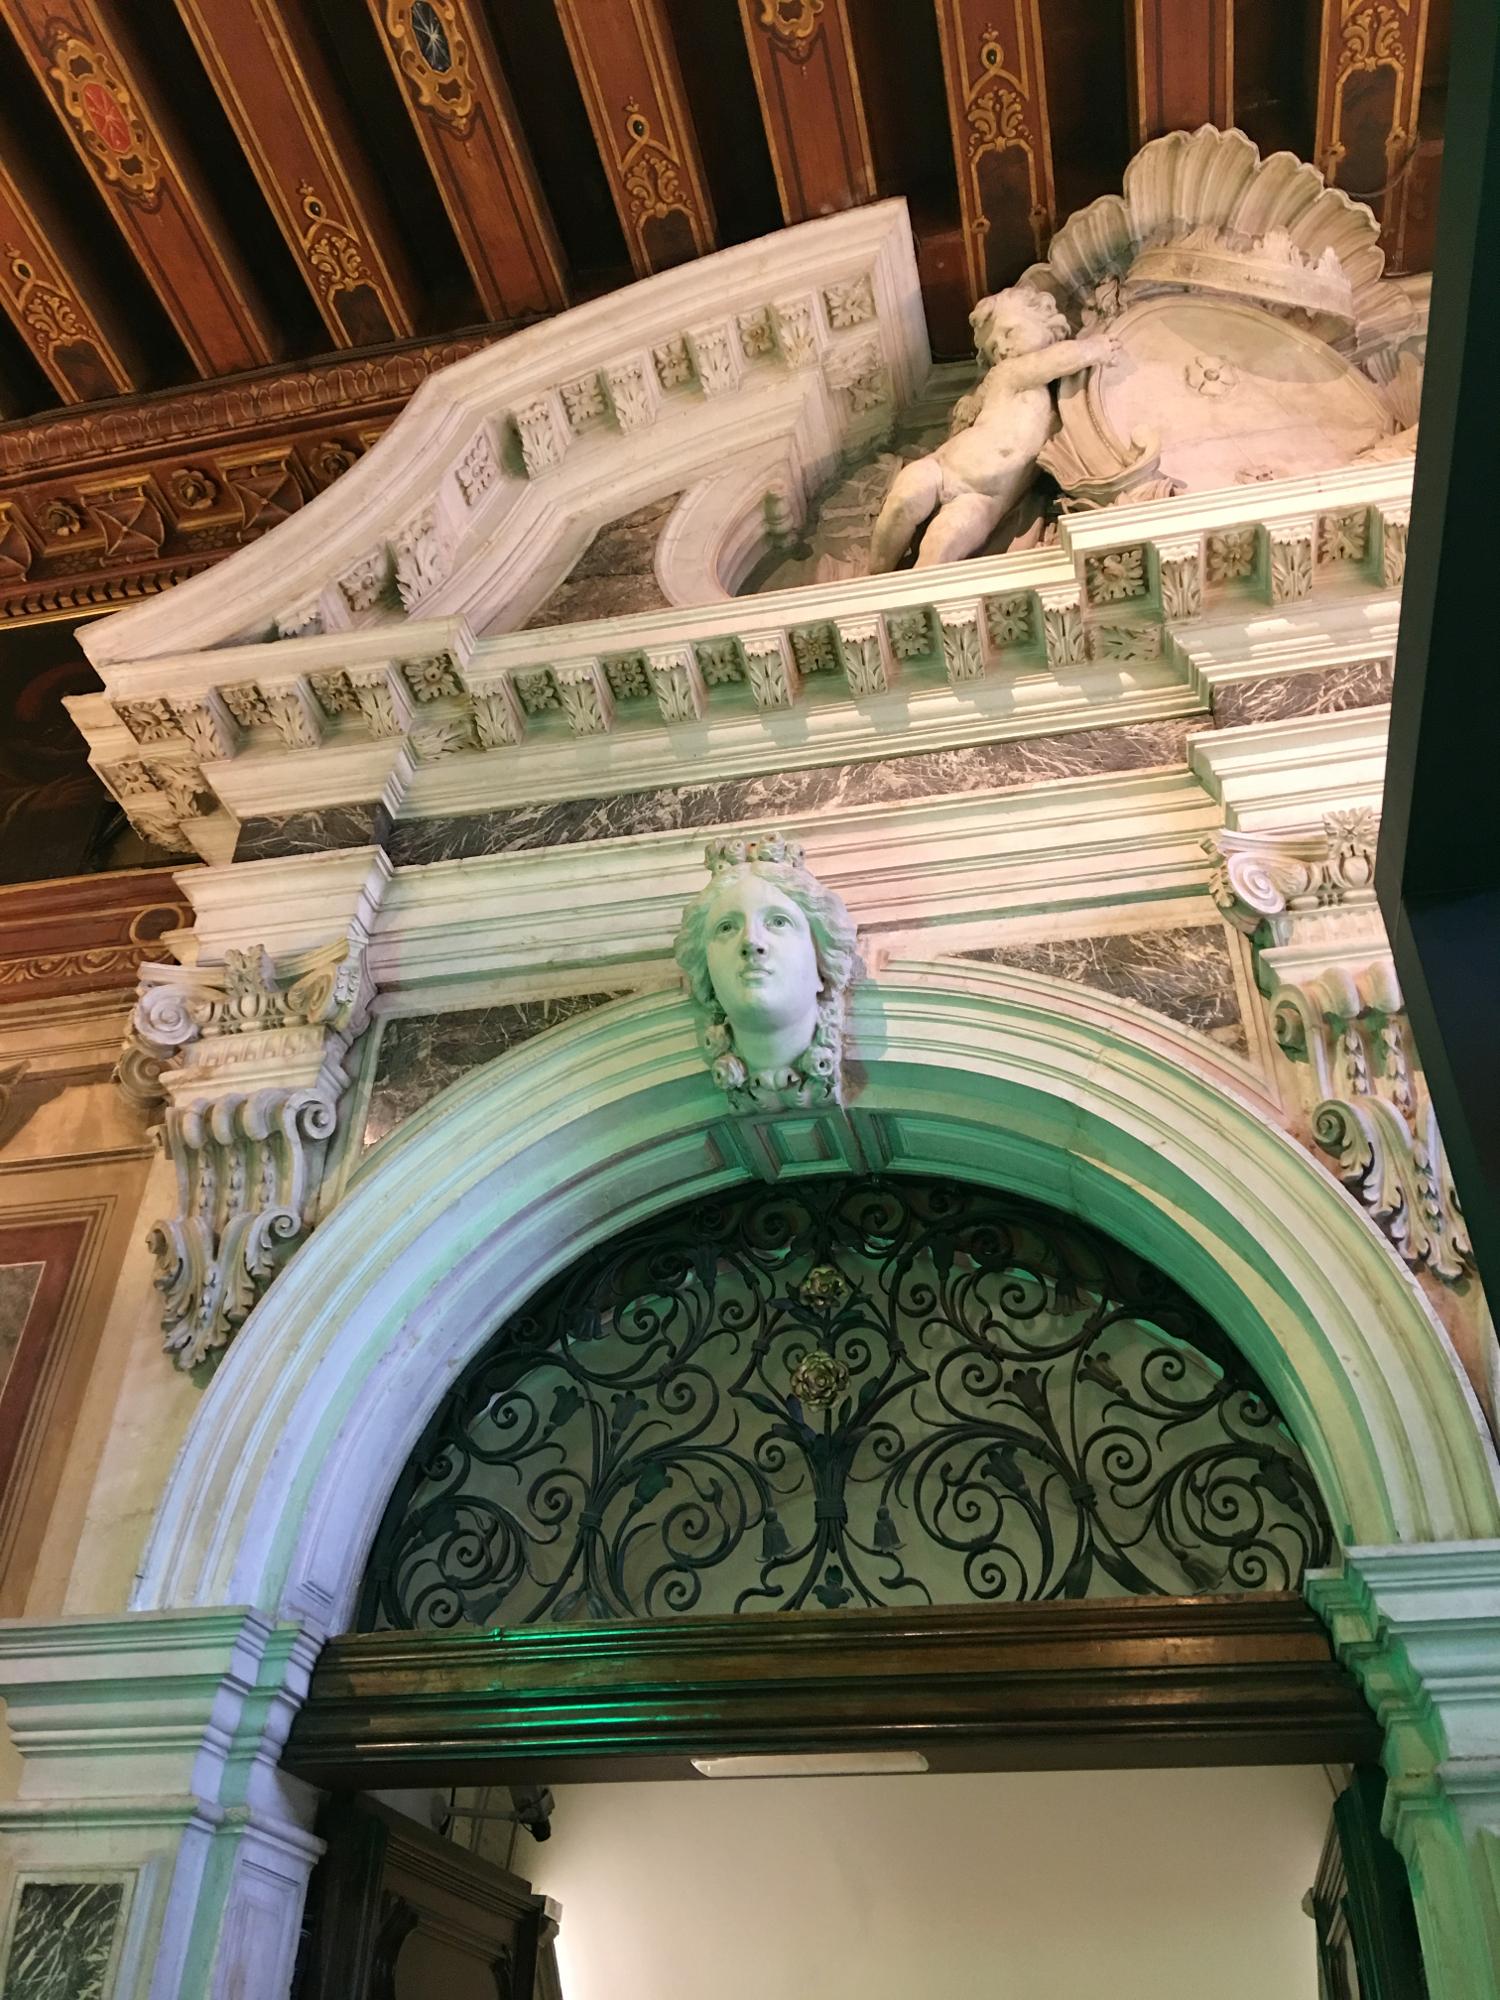 rocaille-blog-venezia-palazzo-mocenigo-cabinet-of-curiosities-collezione-storp-profumo-6